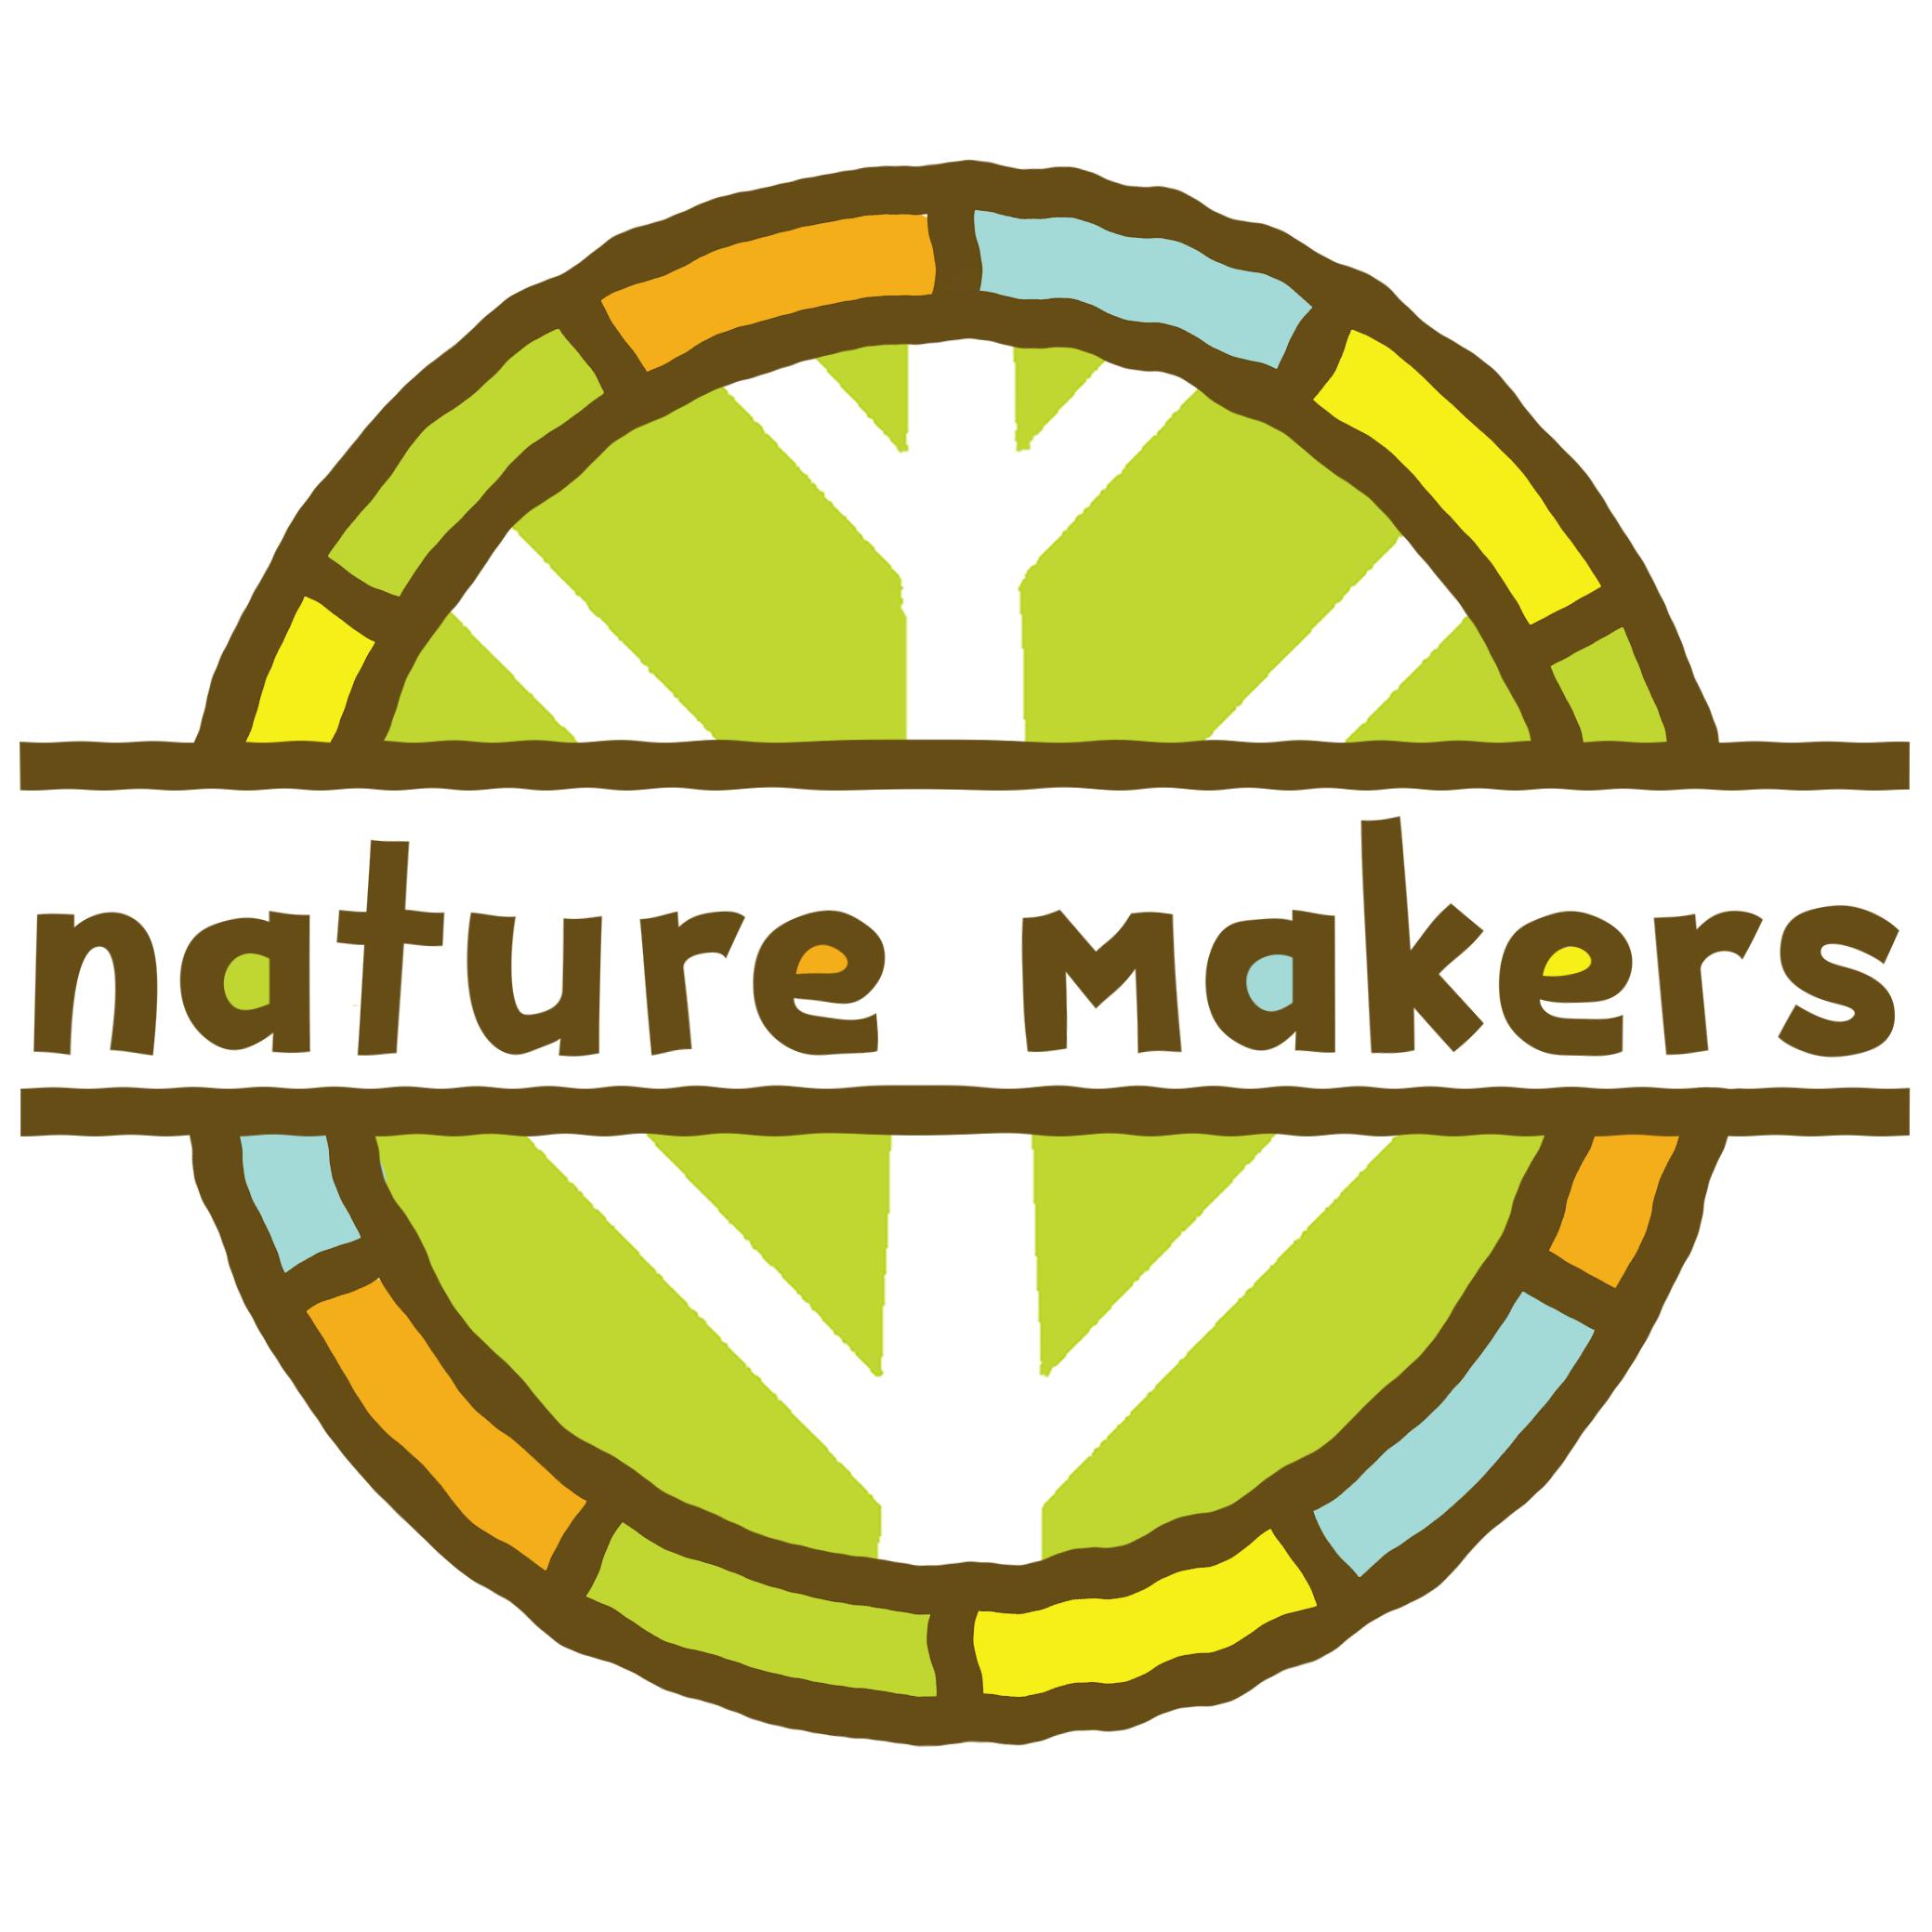 Nature Makers UK's logo